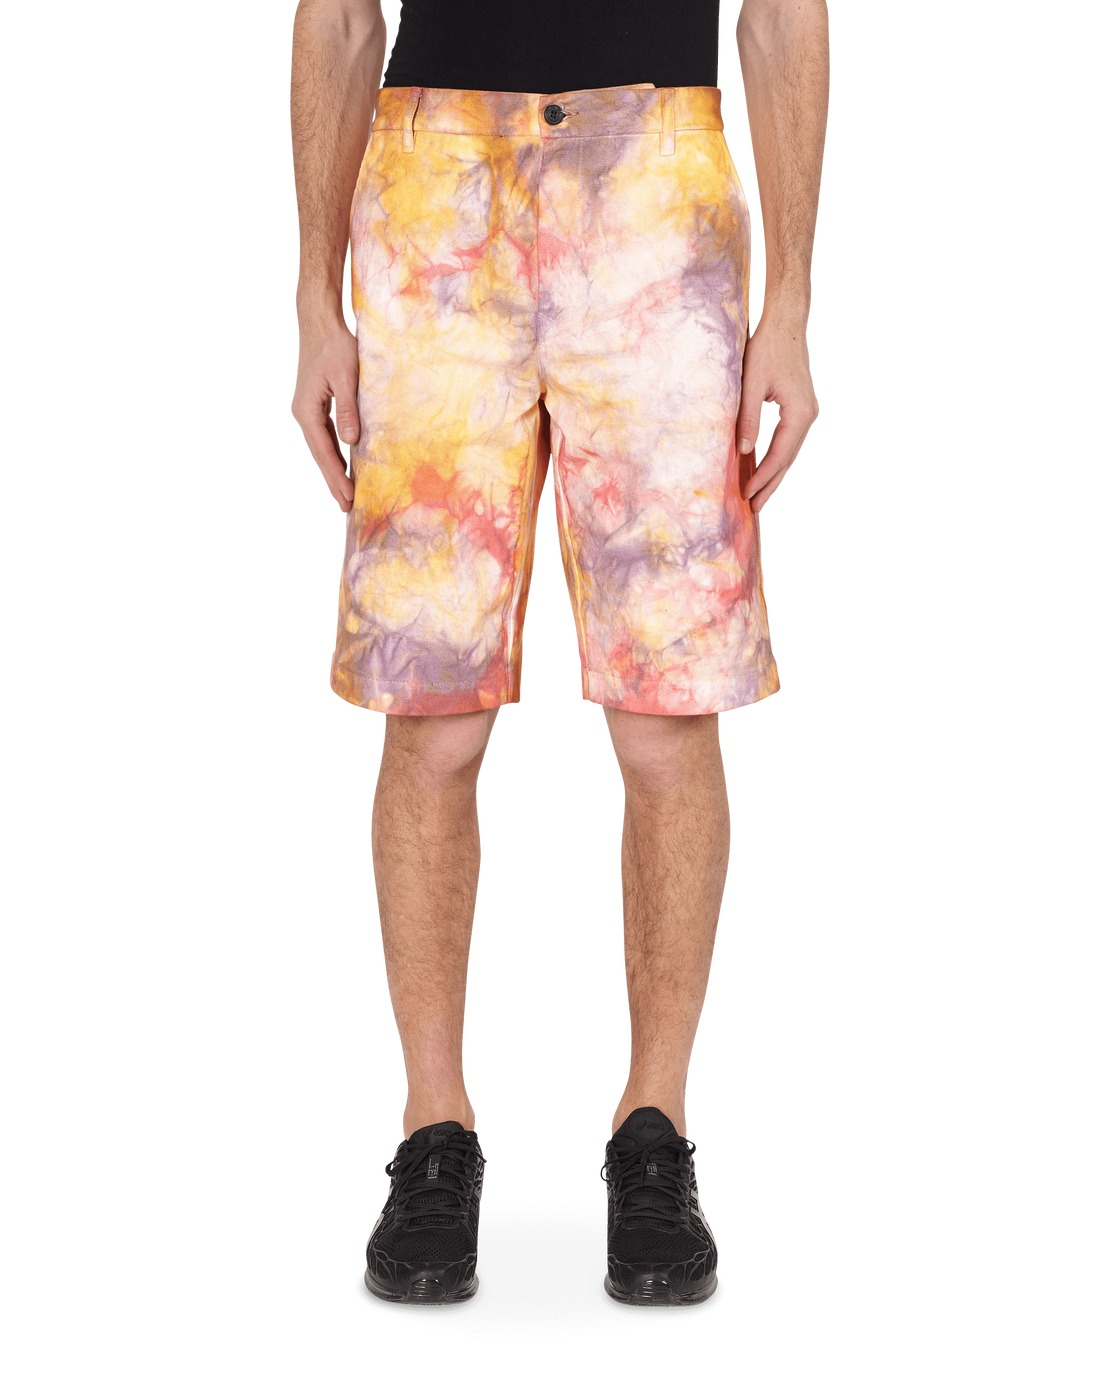 Aries Tie Dye Chino Shorts Multicolor